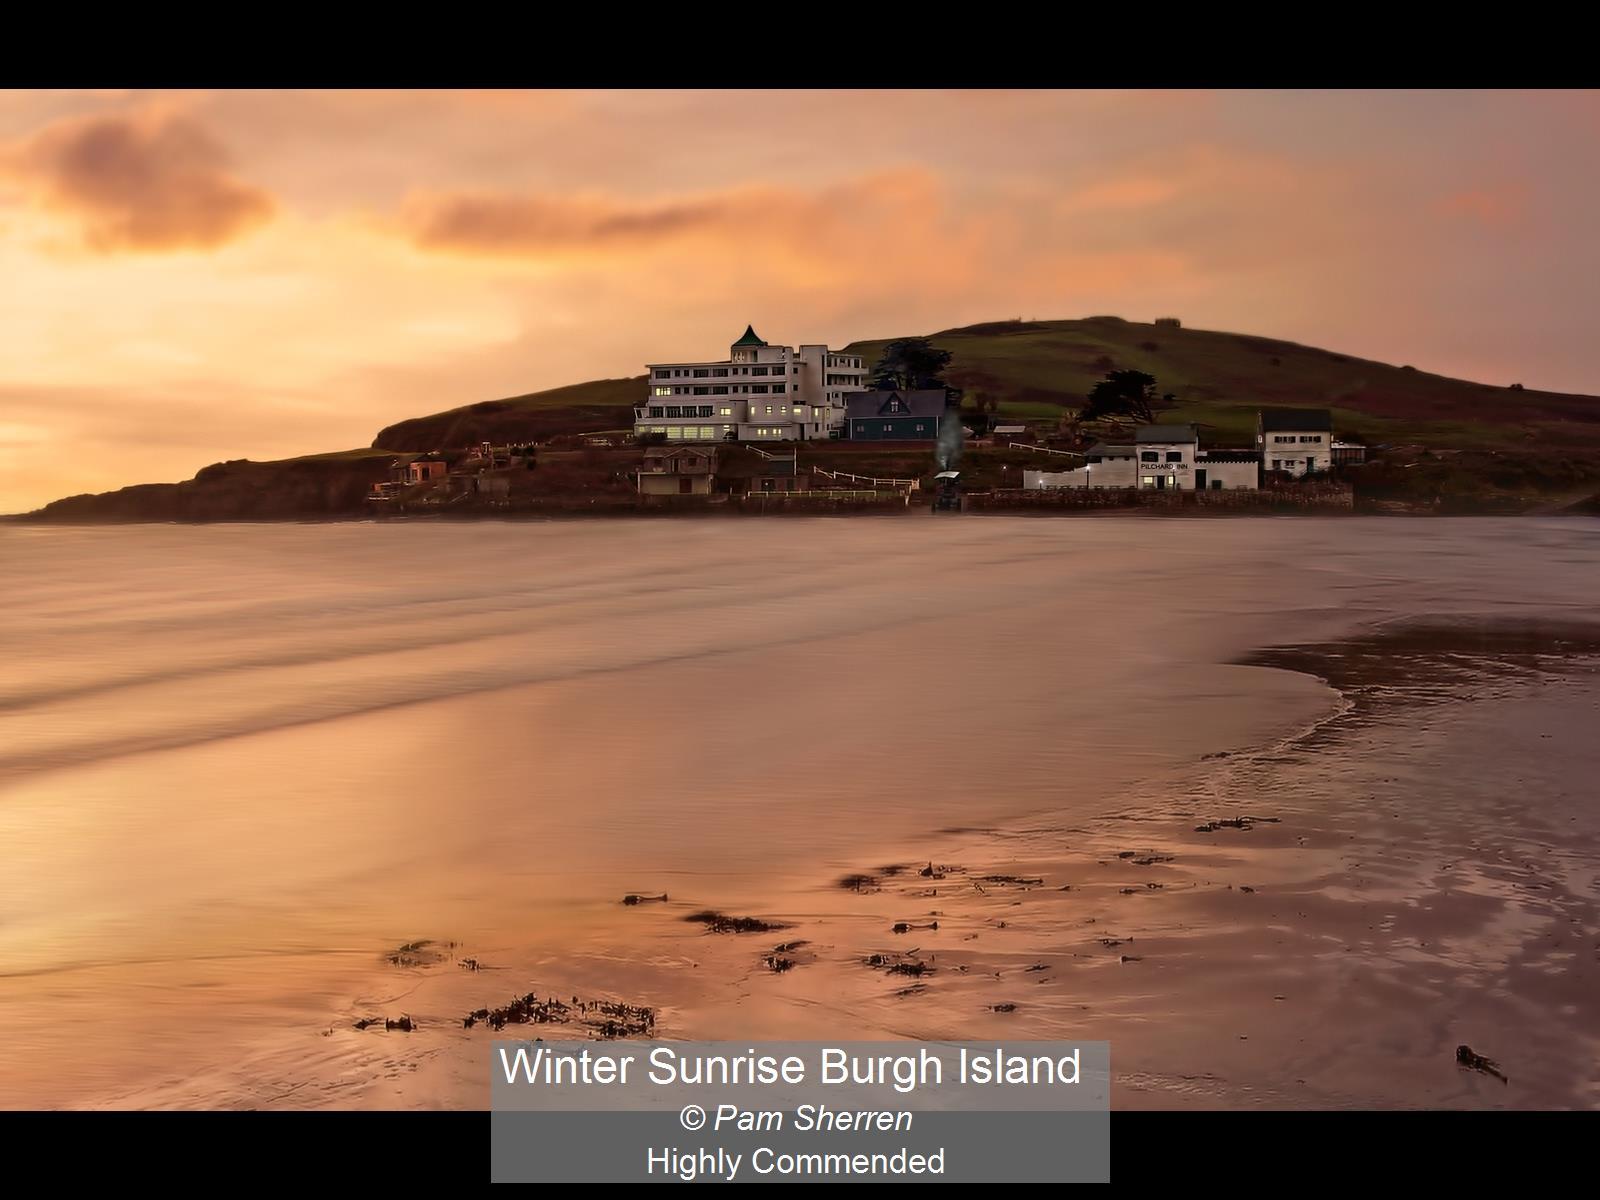 Winter Sunrise Burgh Island_Pam Sherren_